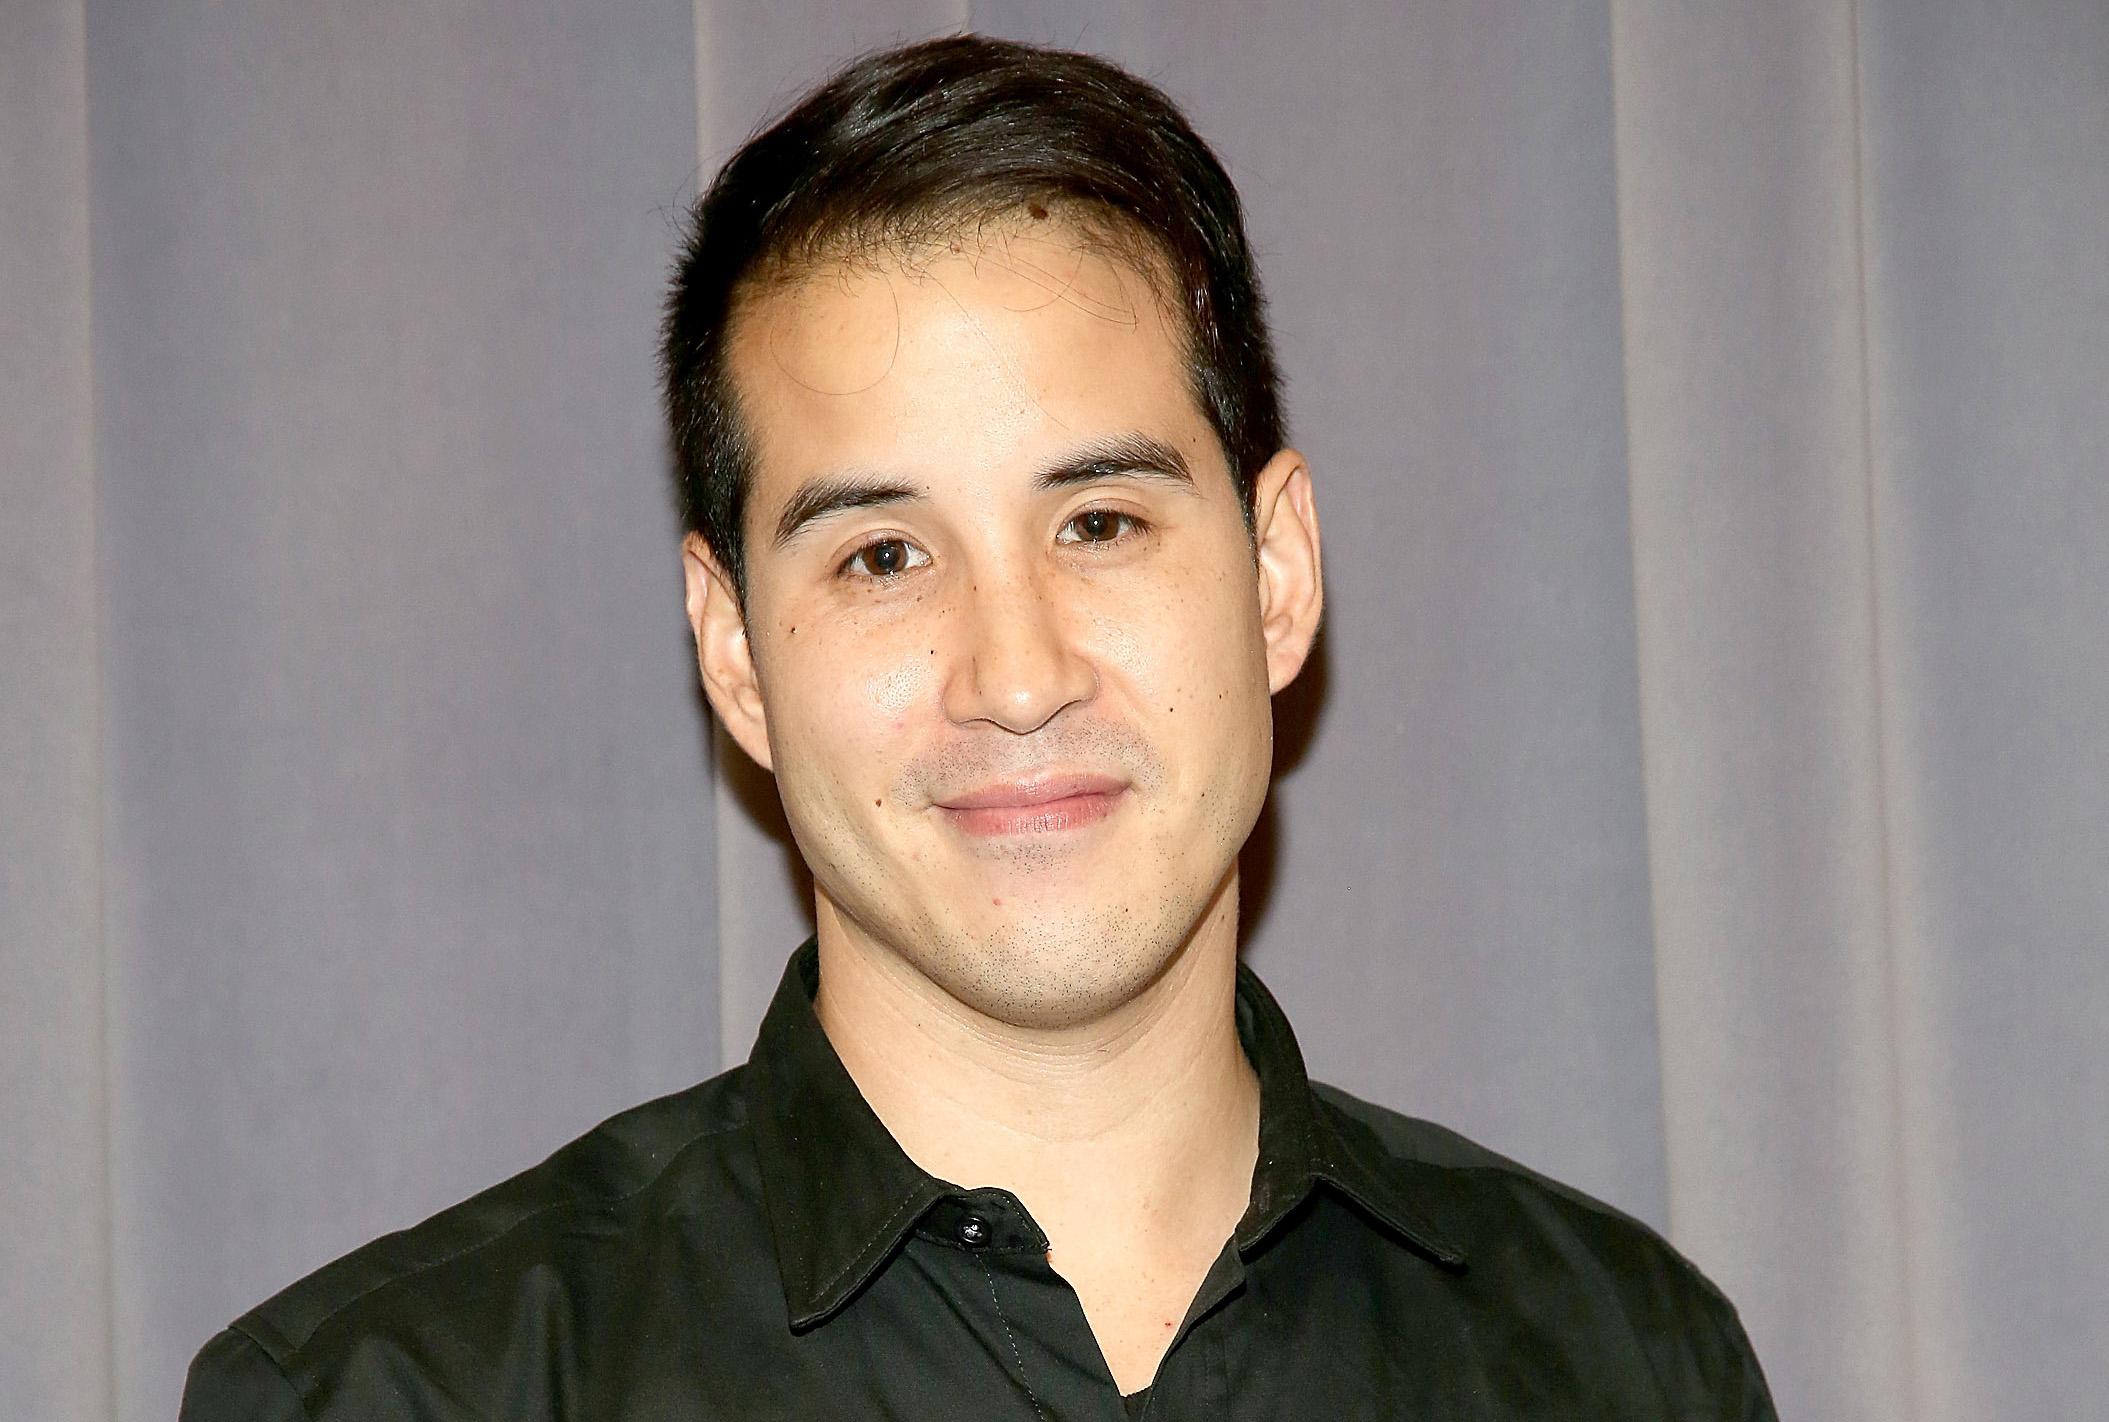 Ryan Koo is seen on Dec. 1, 2014 in New York City.